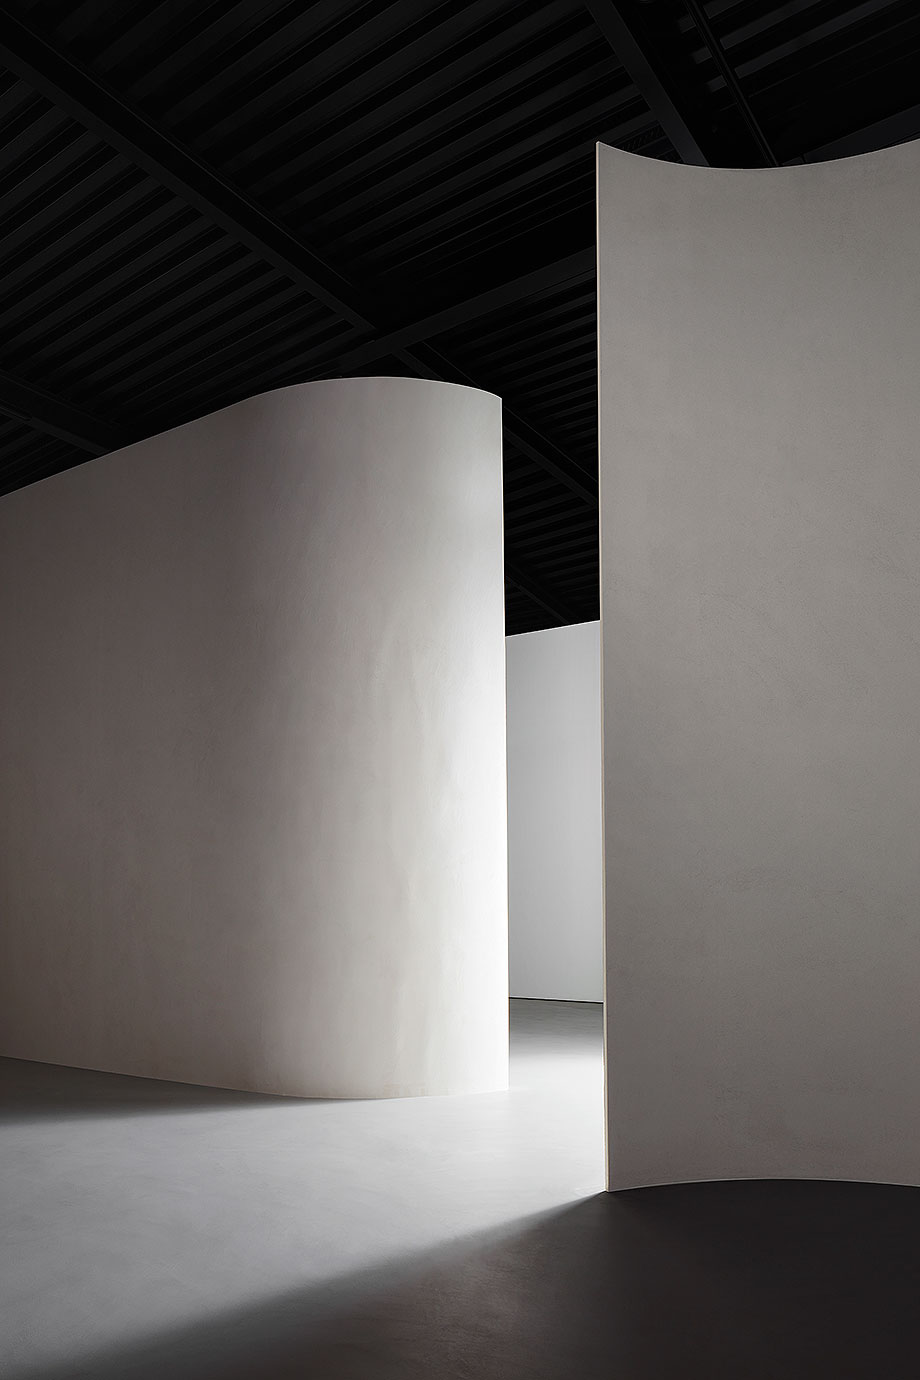 showroom sede corporativa mdf italia en mariano comense (5) - foto thomas pagani